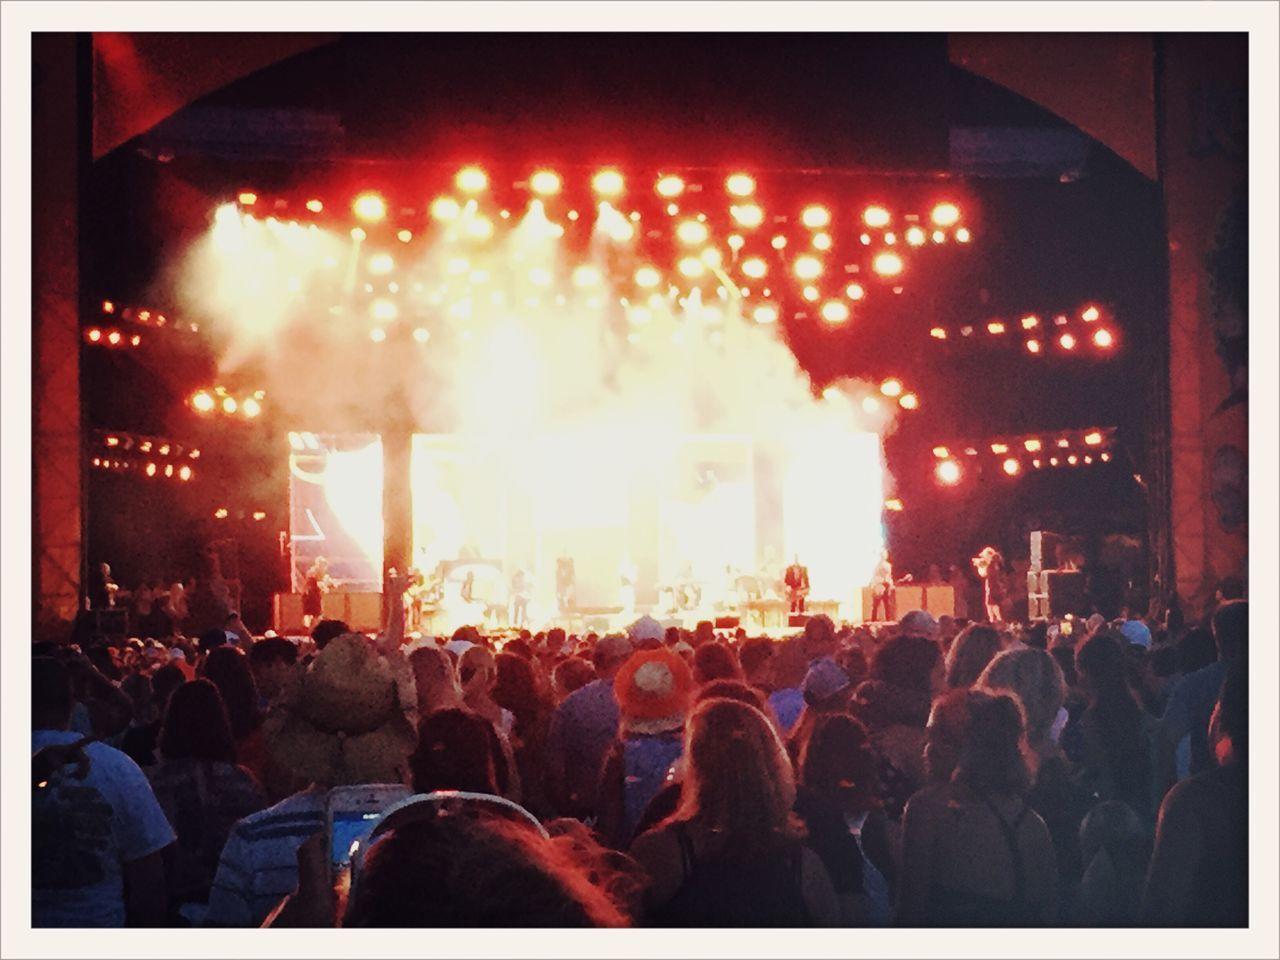 Country Fest: Miranda Lambert Summer Concerts AMPt_community Best EyeEm Shot Summer2016 NEM Mood Best Of EyeEm Miranda Lambert